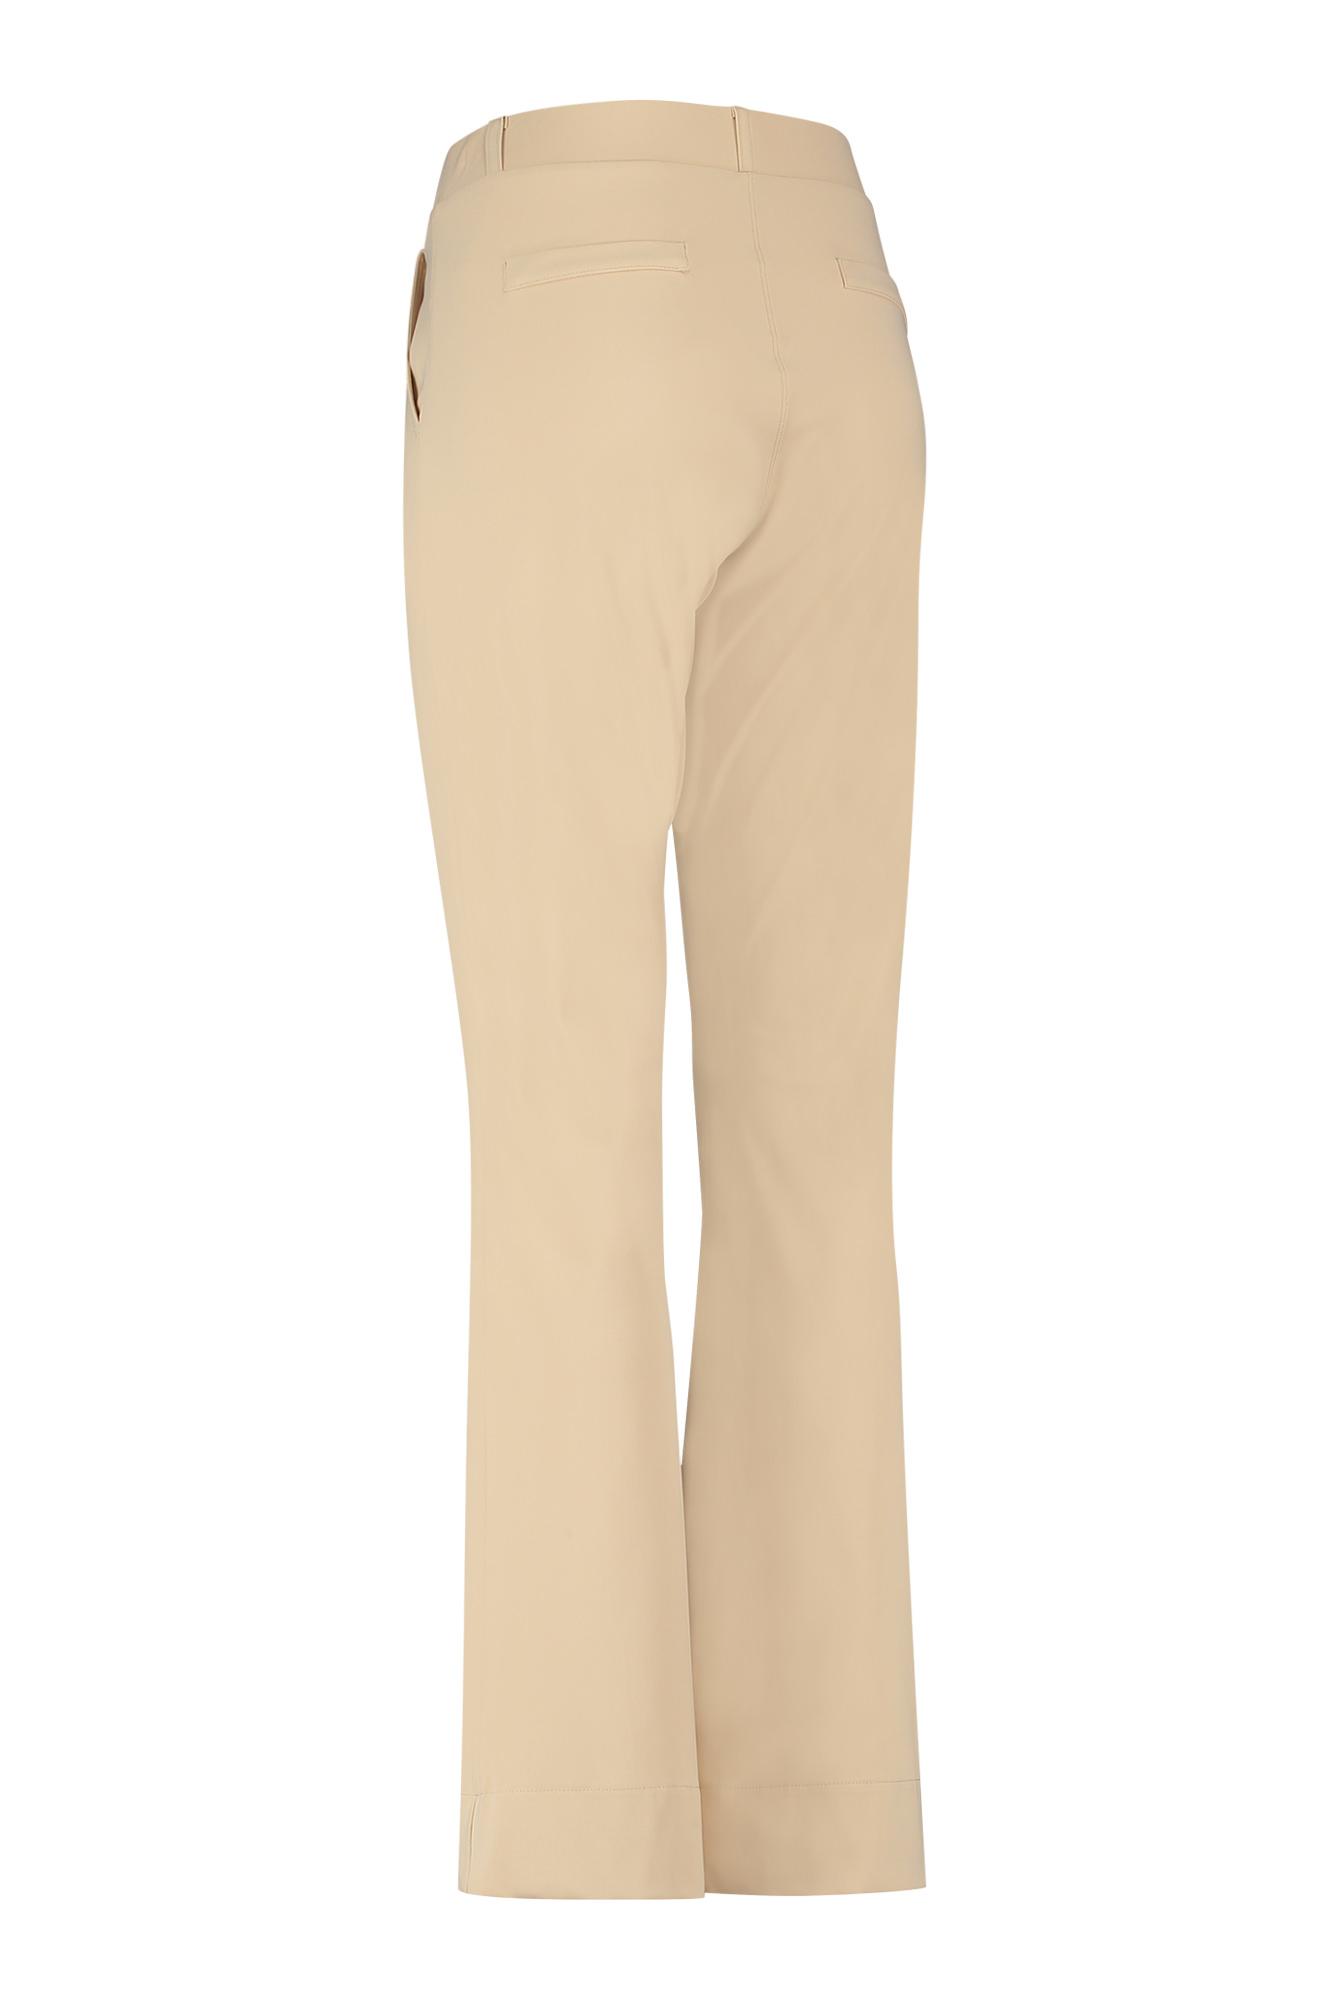 Flair Bonded Trousers - Sahara